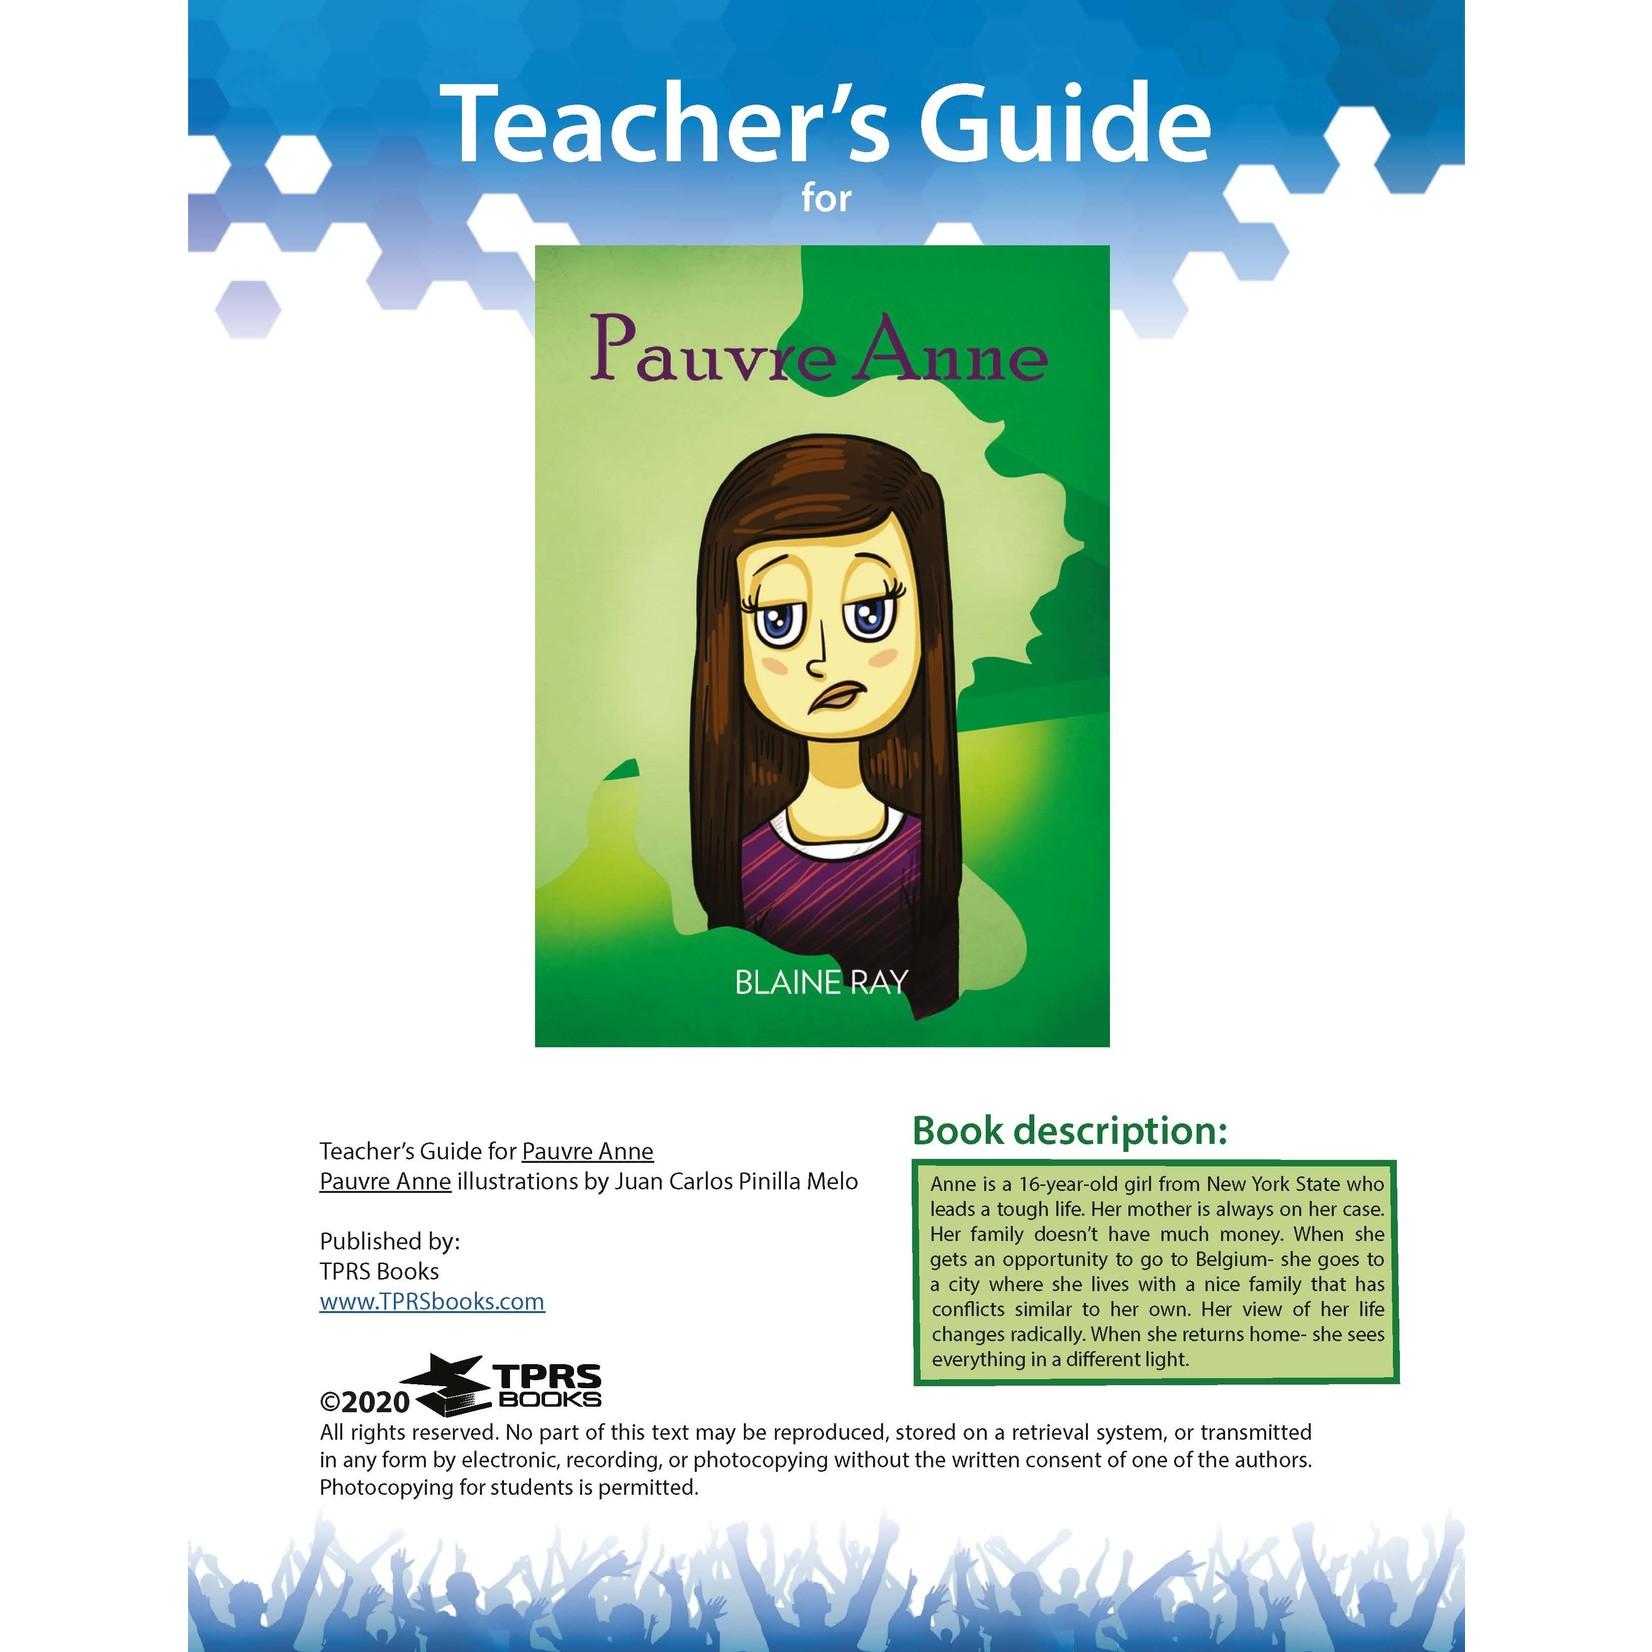 TPRS Books Pauvre Anne - Teacher's Guide